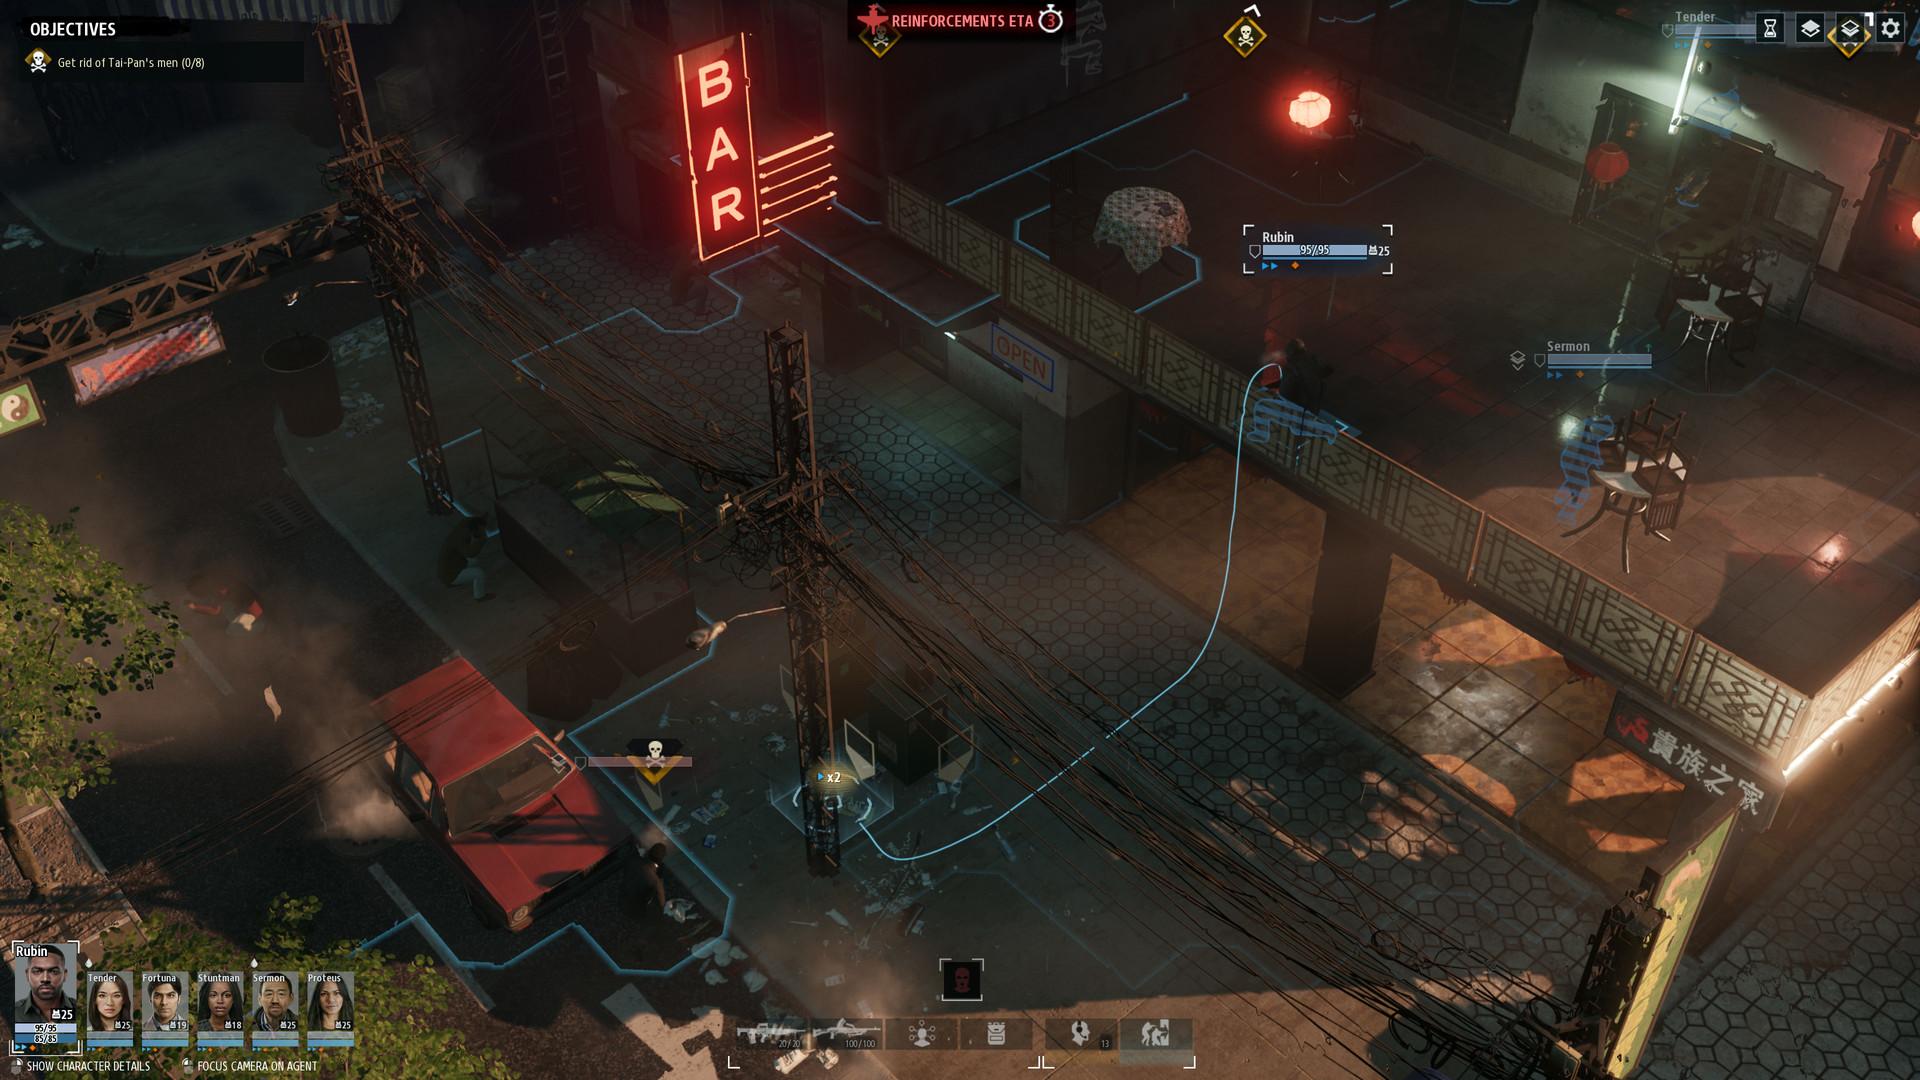 Скриншот игры Phantom Doctrine v1.0.9